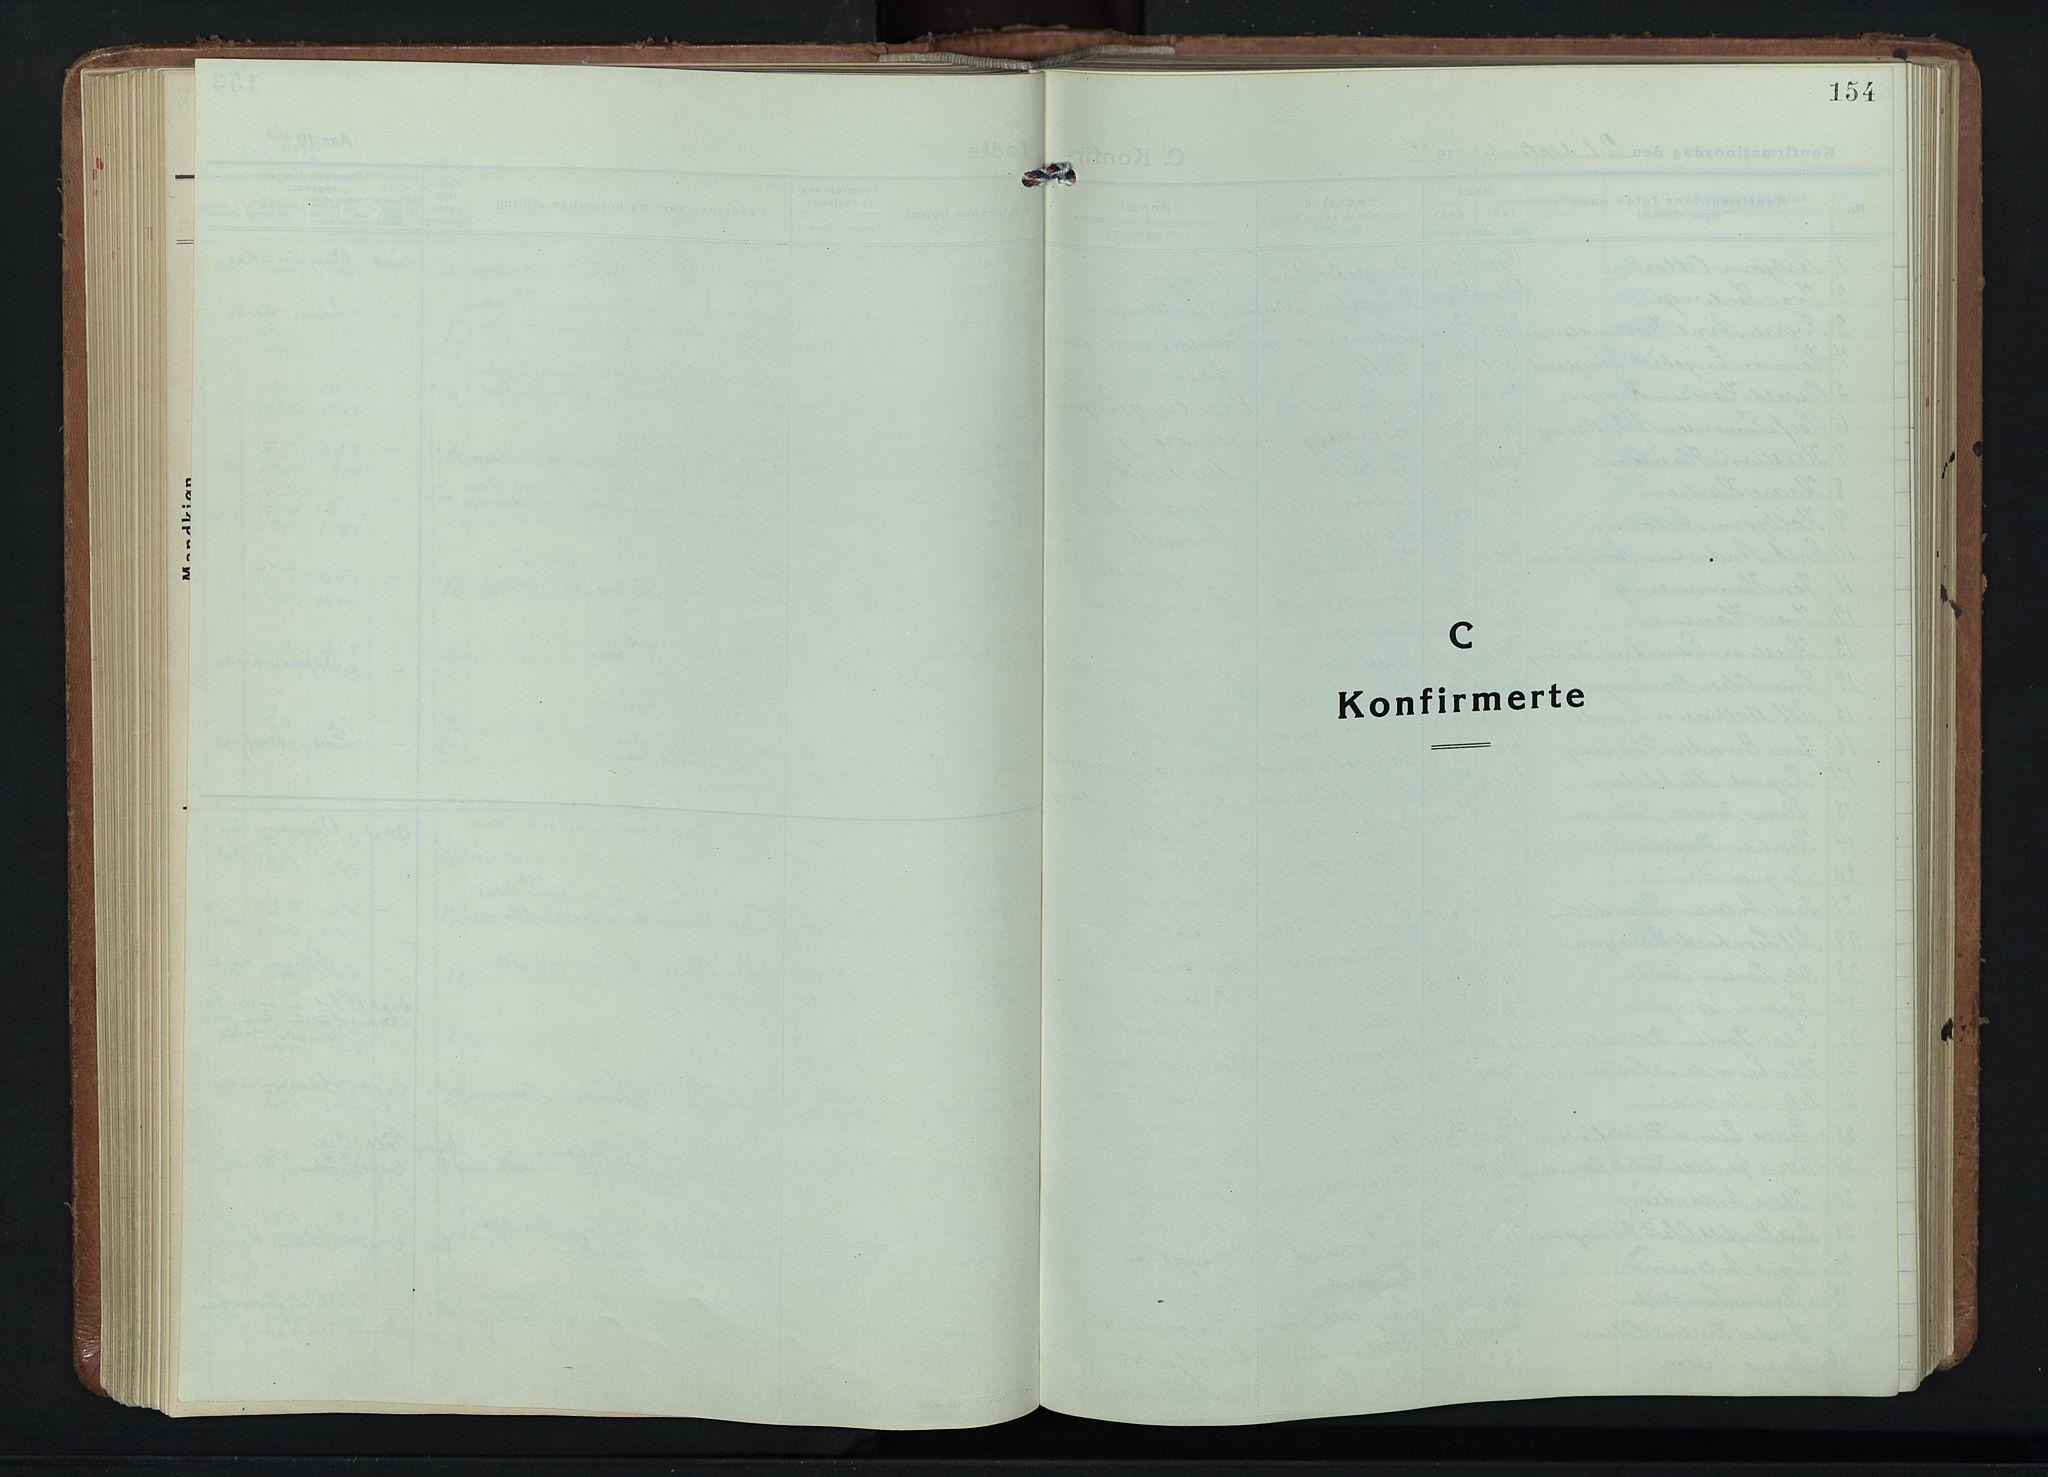 SAH, Fåberg prestekontor, Klokkerbok nr. 15, 1924-1949, s. 154